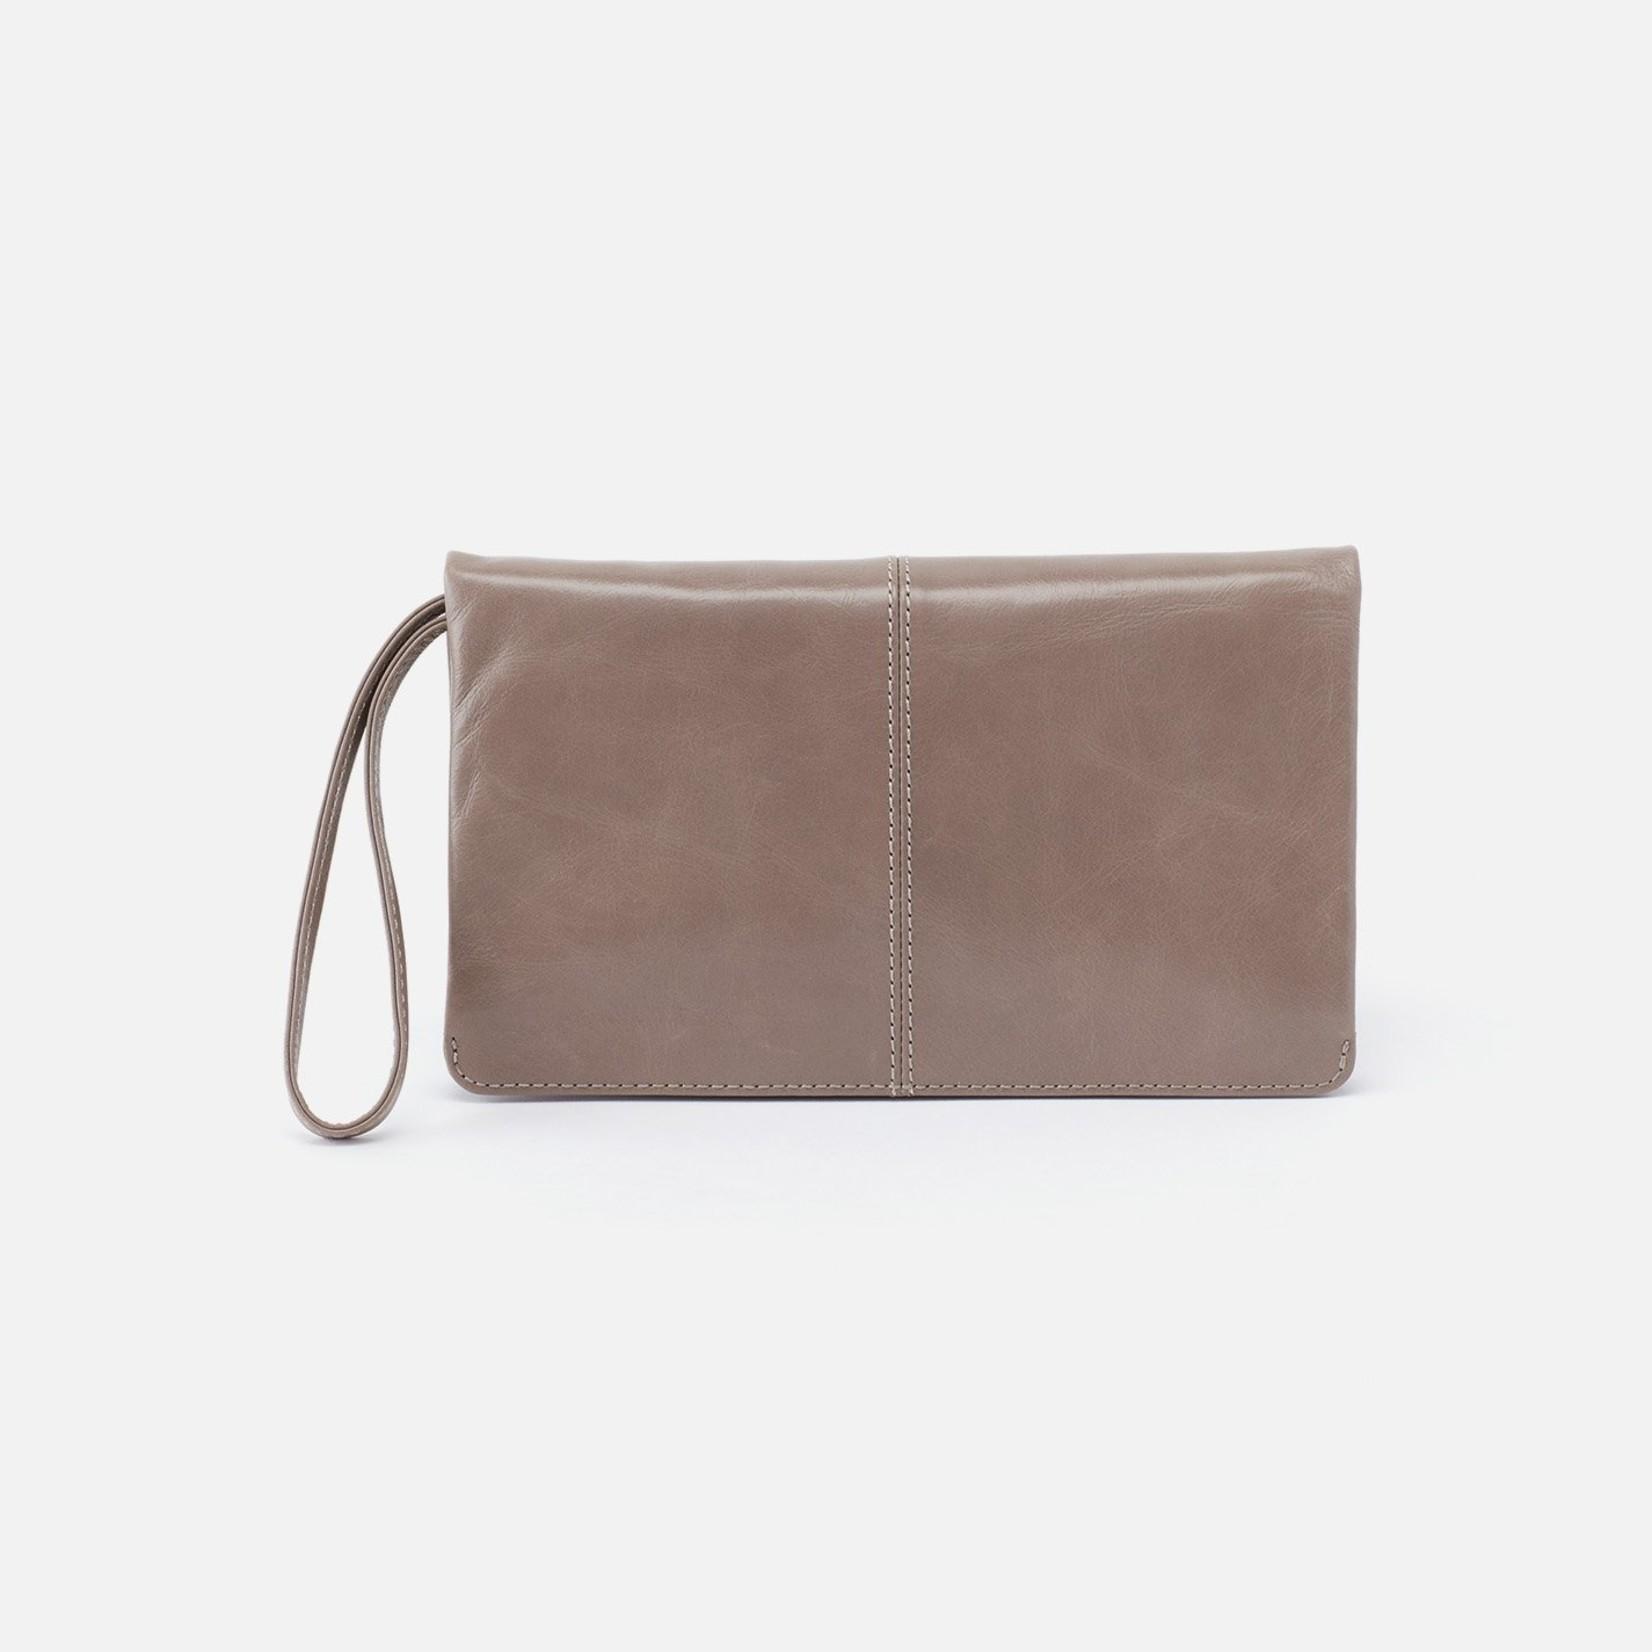 HOBO Bags Evolve Wristlet Ash